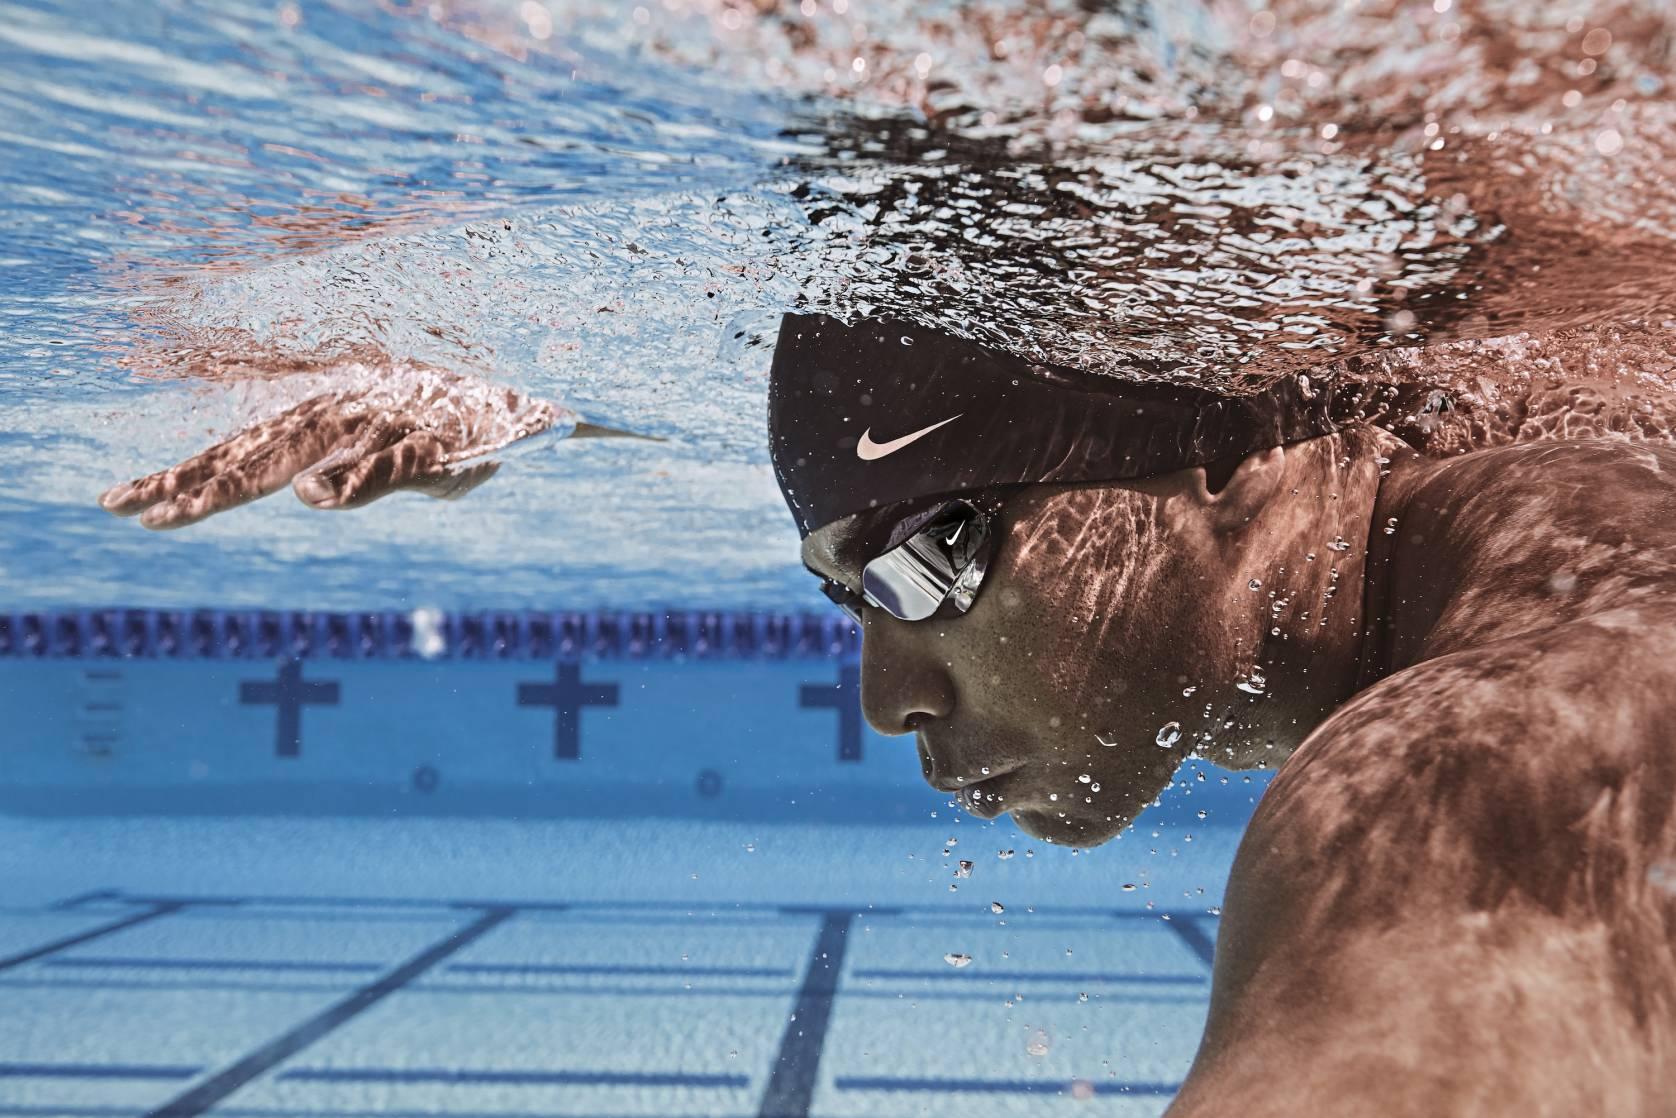 Nike Vapor Swim Goggles